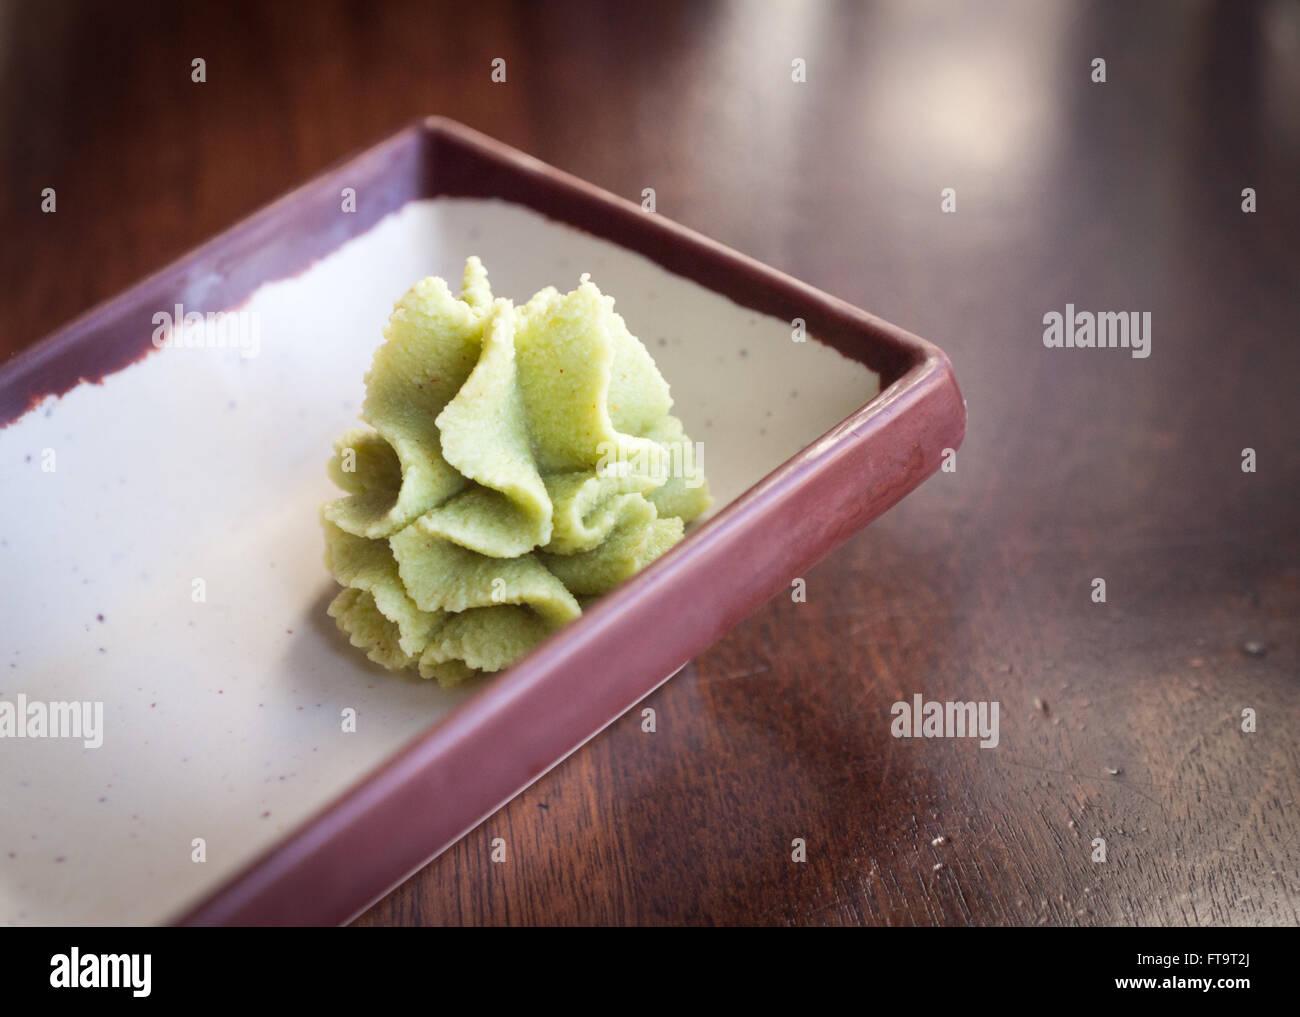 Imitation wasabi (seiyo-wasabi) paste. - Stock Image